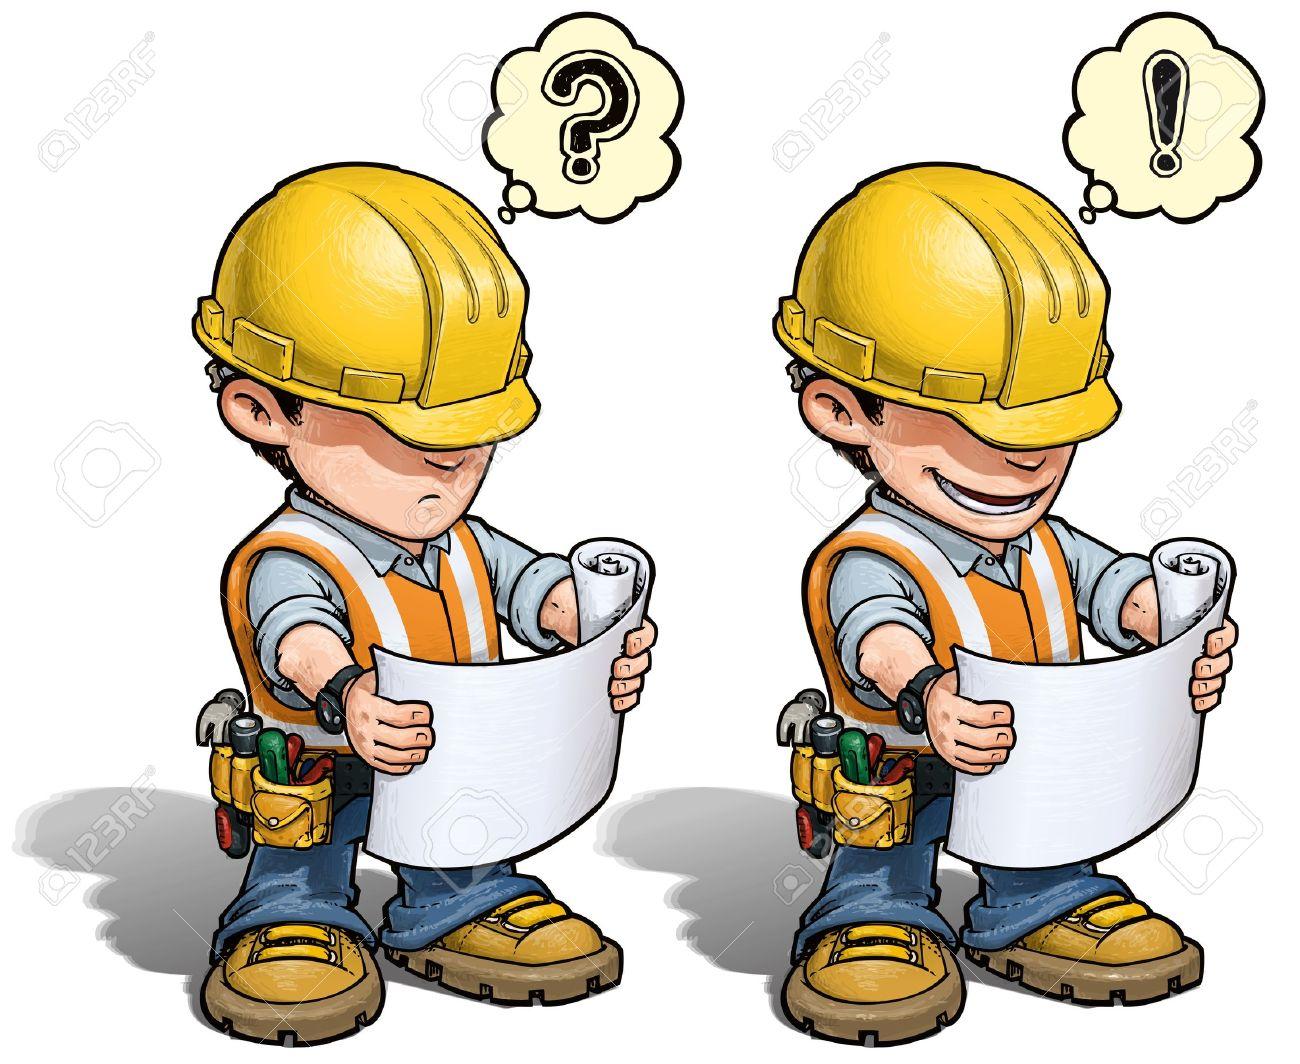 Construction Worker - Reading Plan Stock Vector - 19199946